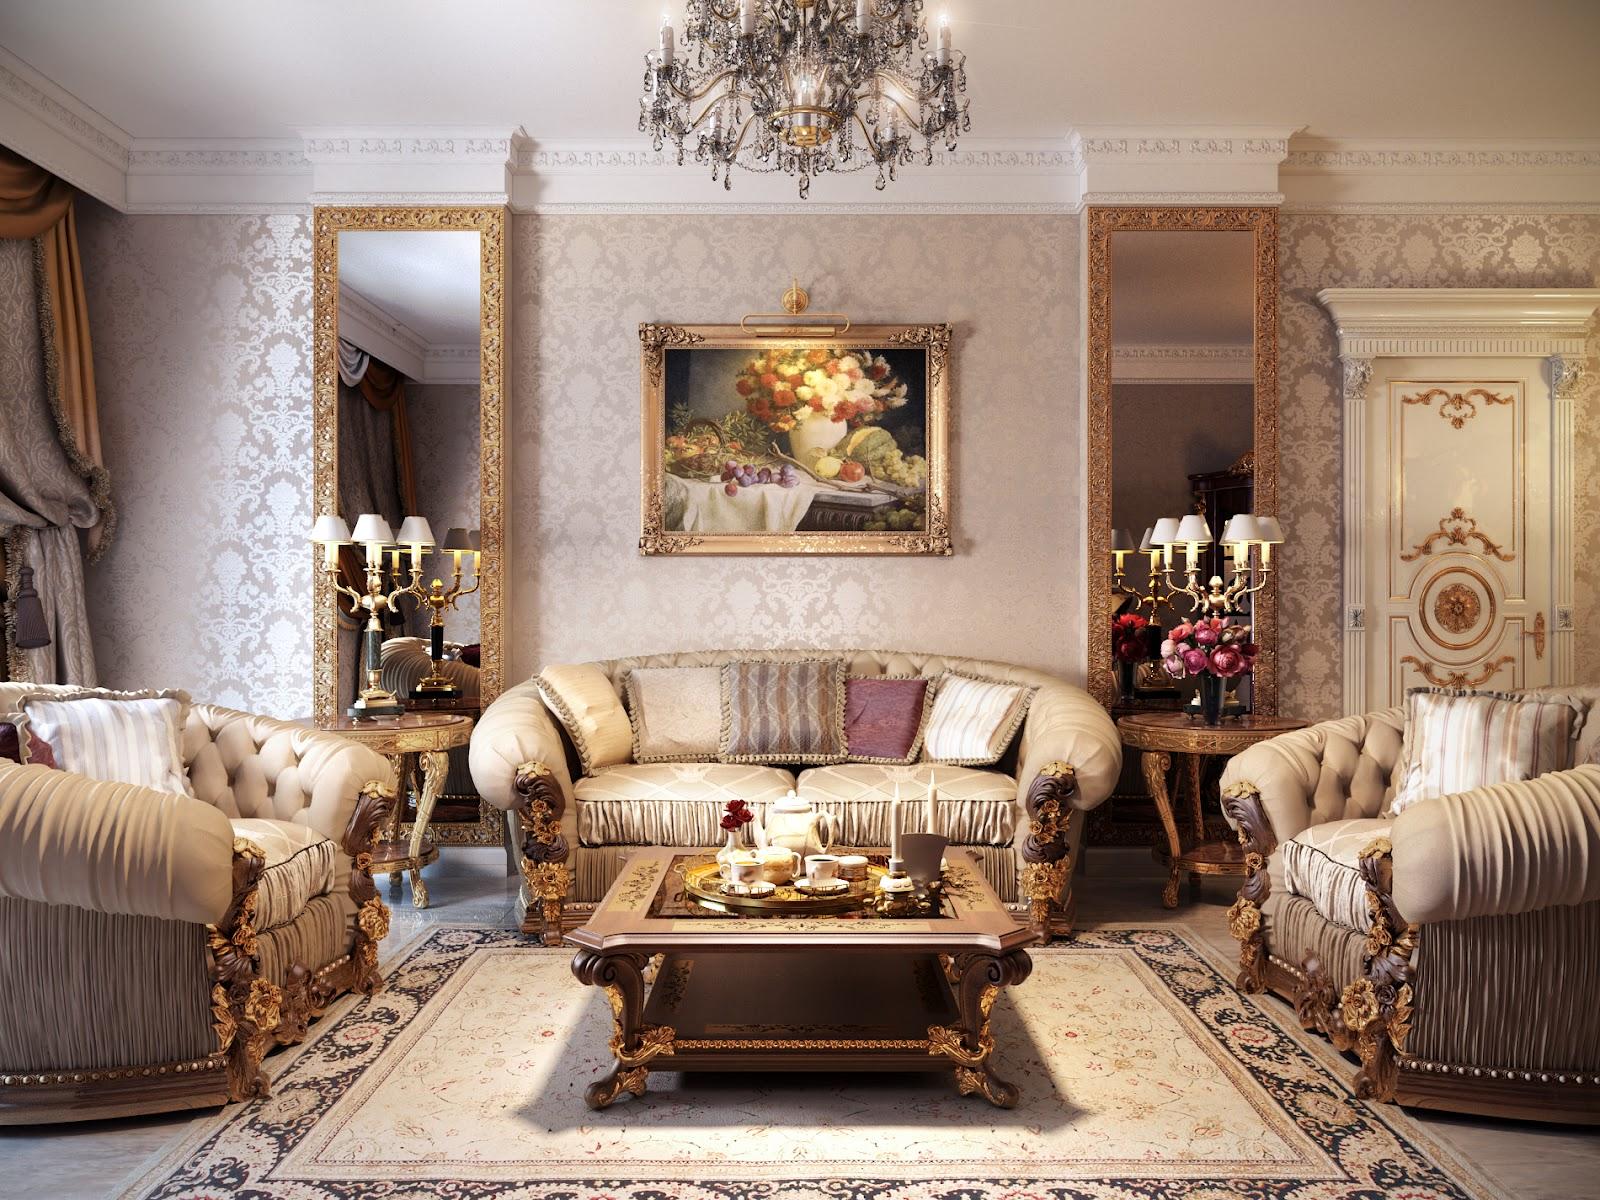 Luxurious Formal Living Room Interior